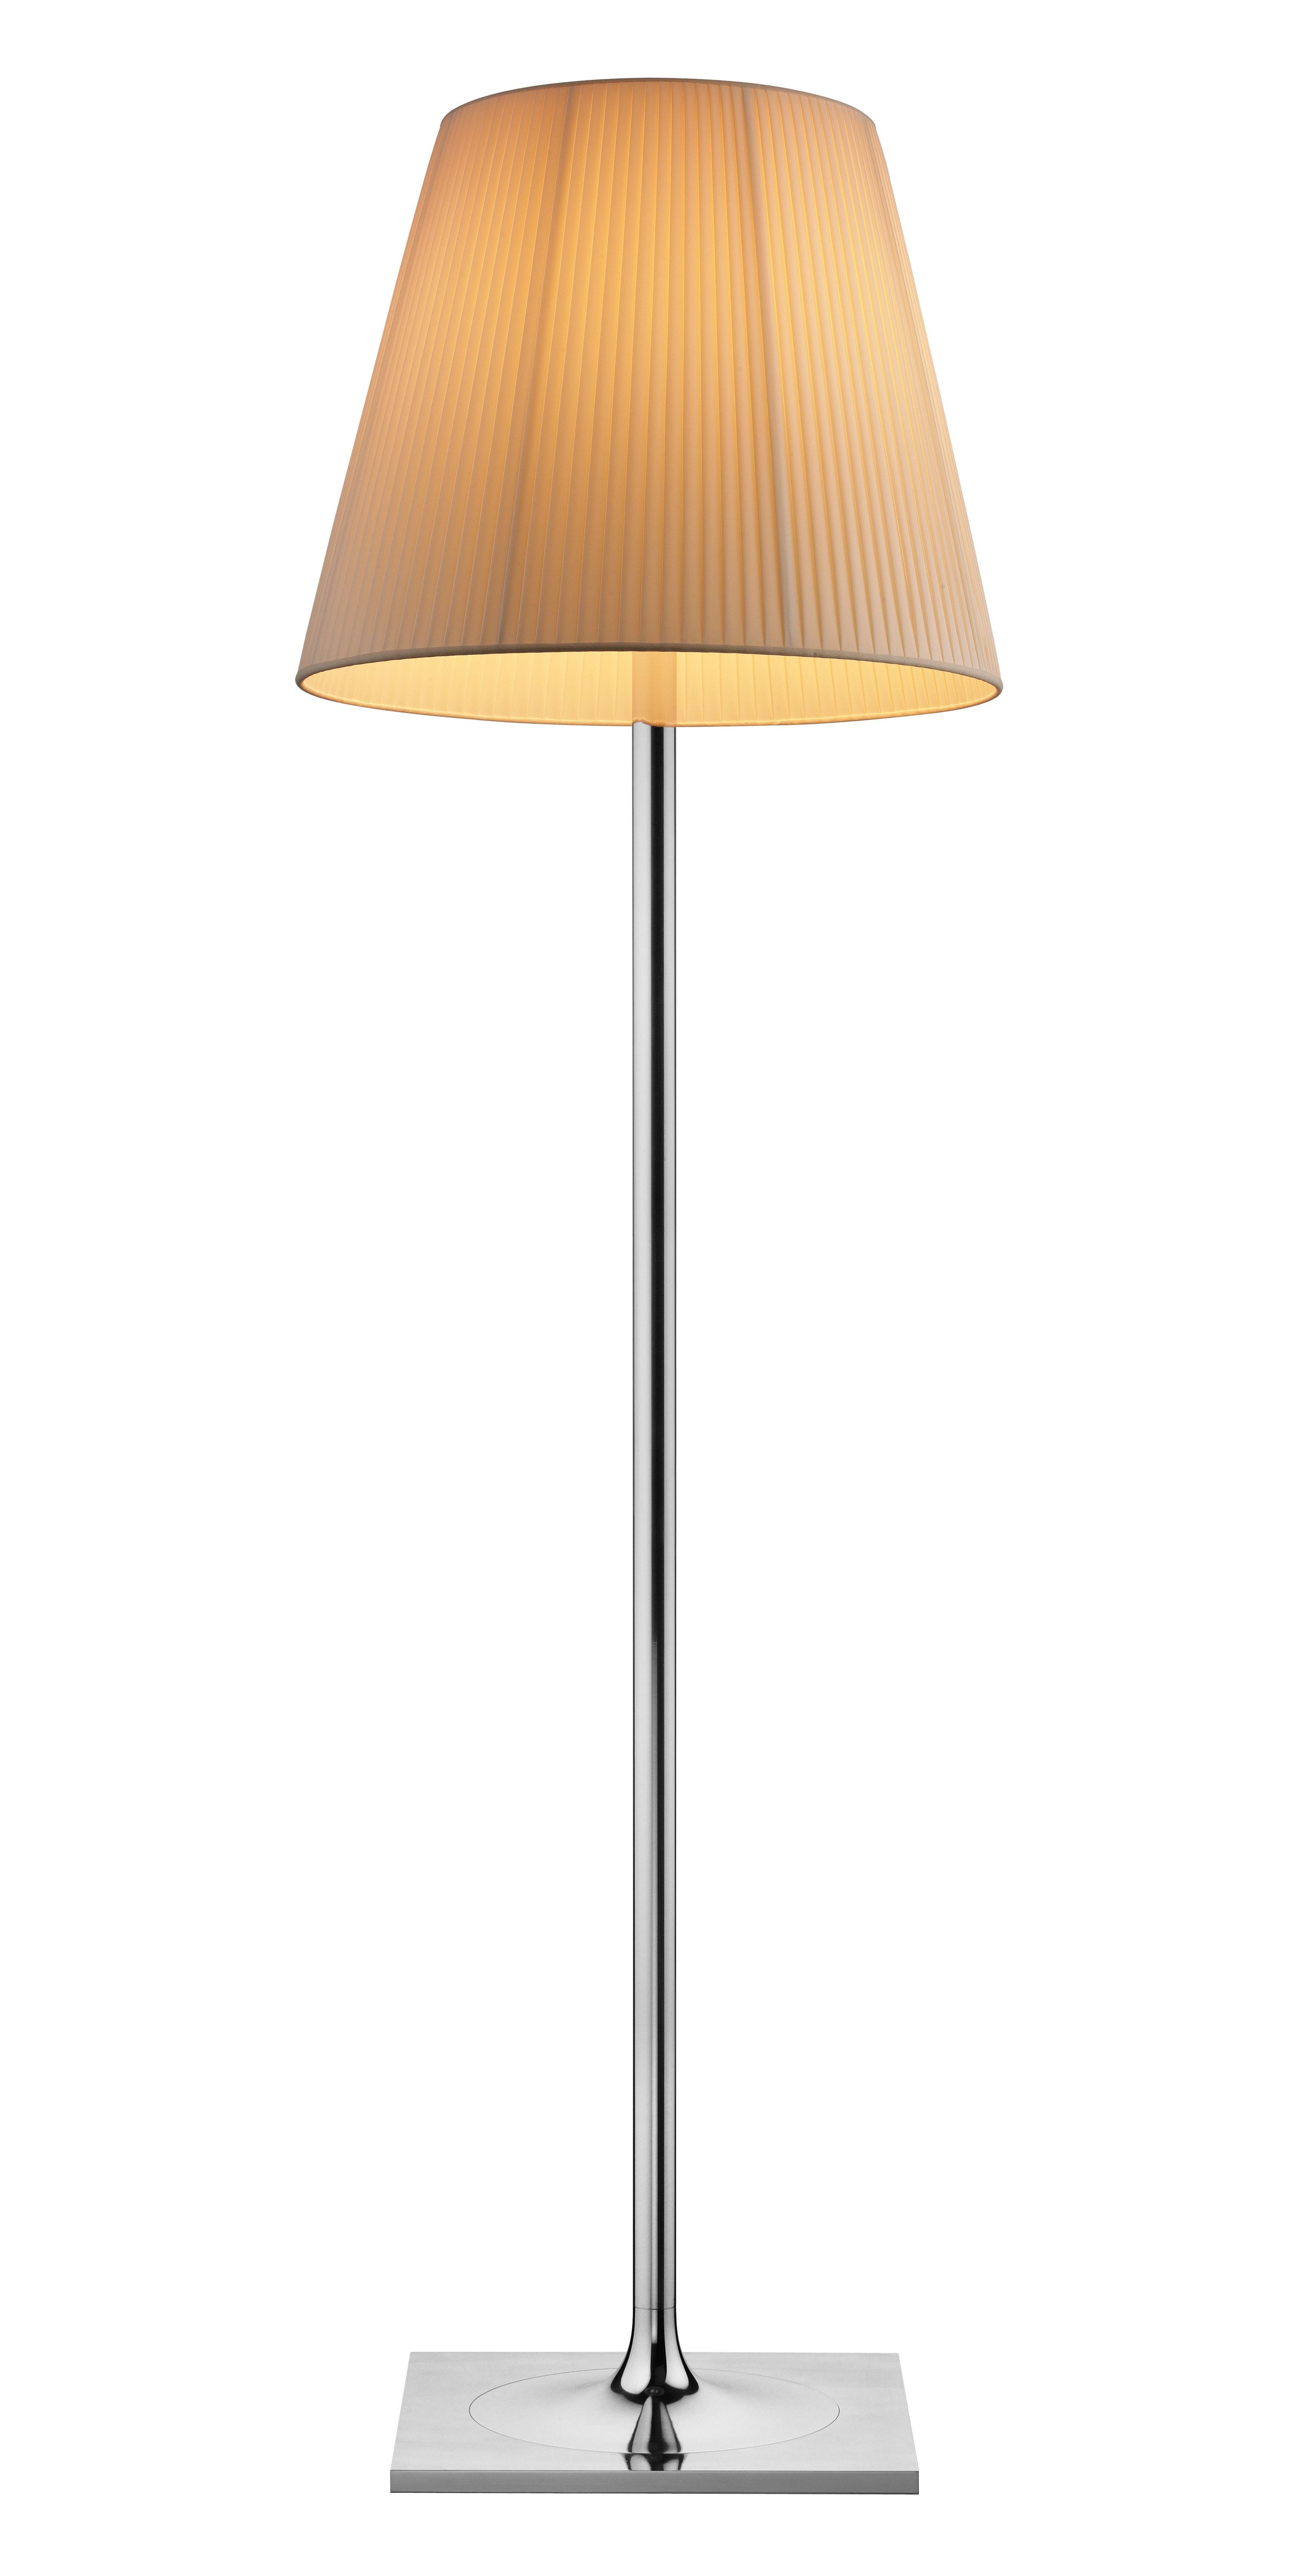 Lighting - Floor lamps - K Tribe F3 Soft Floor lamp - H 183 cm by Flos - Fabric - Fabric, Polished aluminium